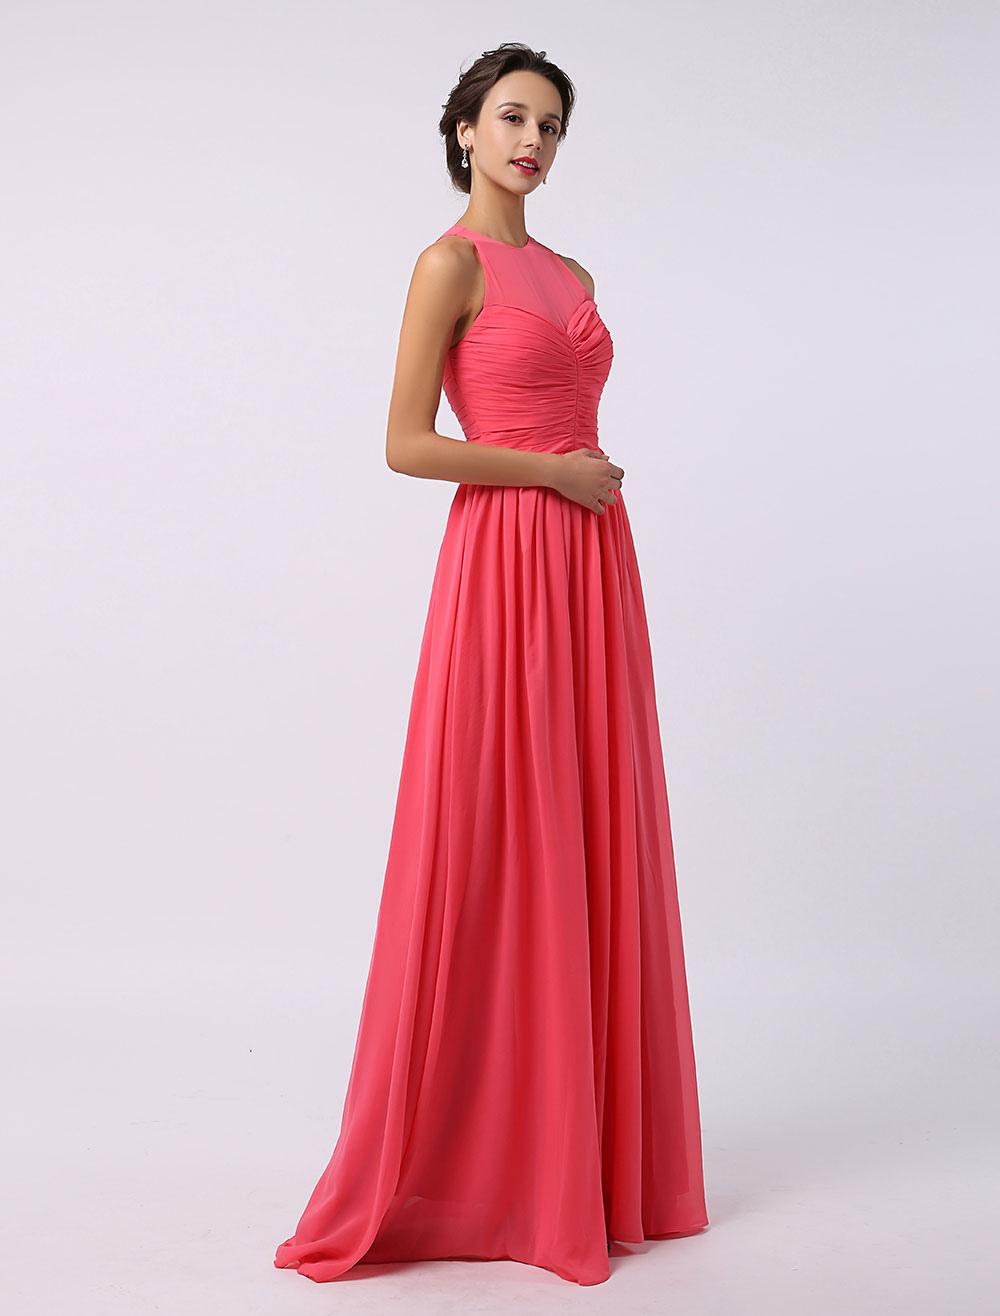 A-Line Illusion Neckline Floor-Length Chiffon Bridesmaid Dress Milanoo